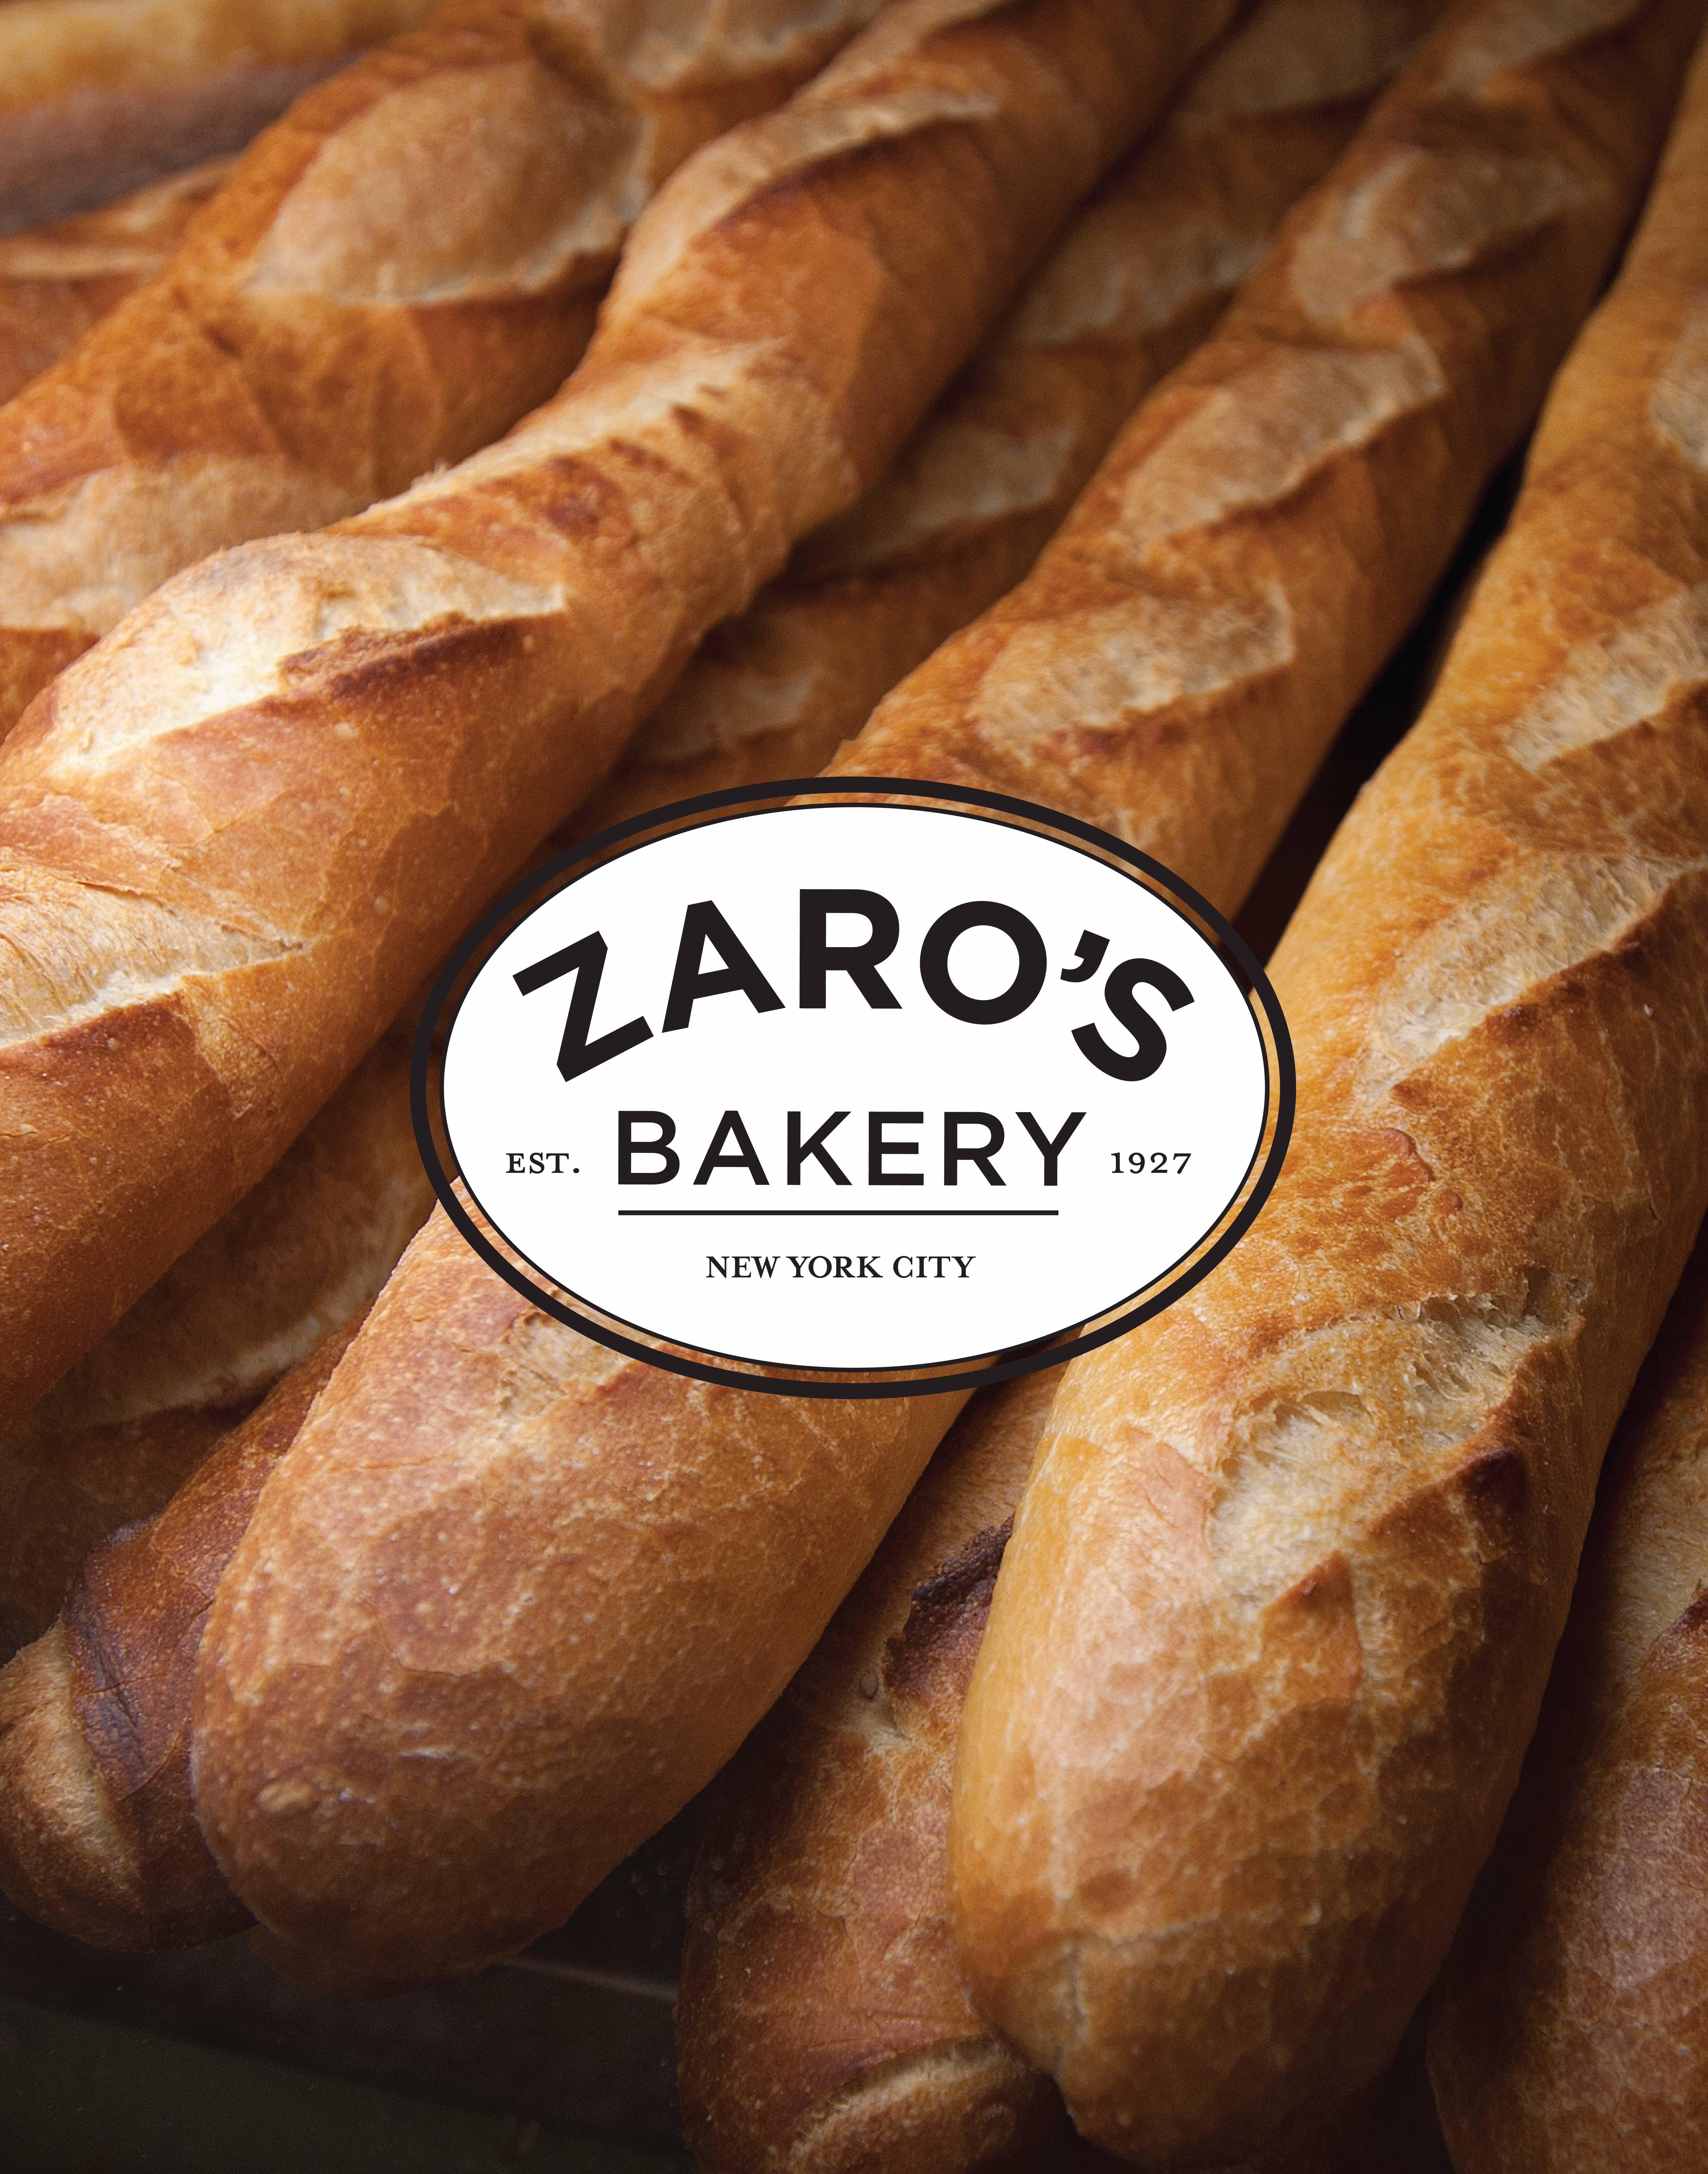 zaro's Zaros bakery, Bakery, Food